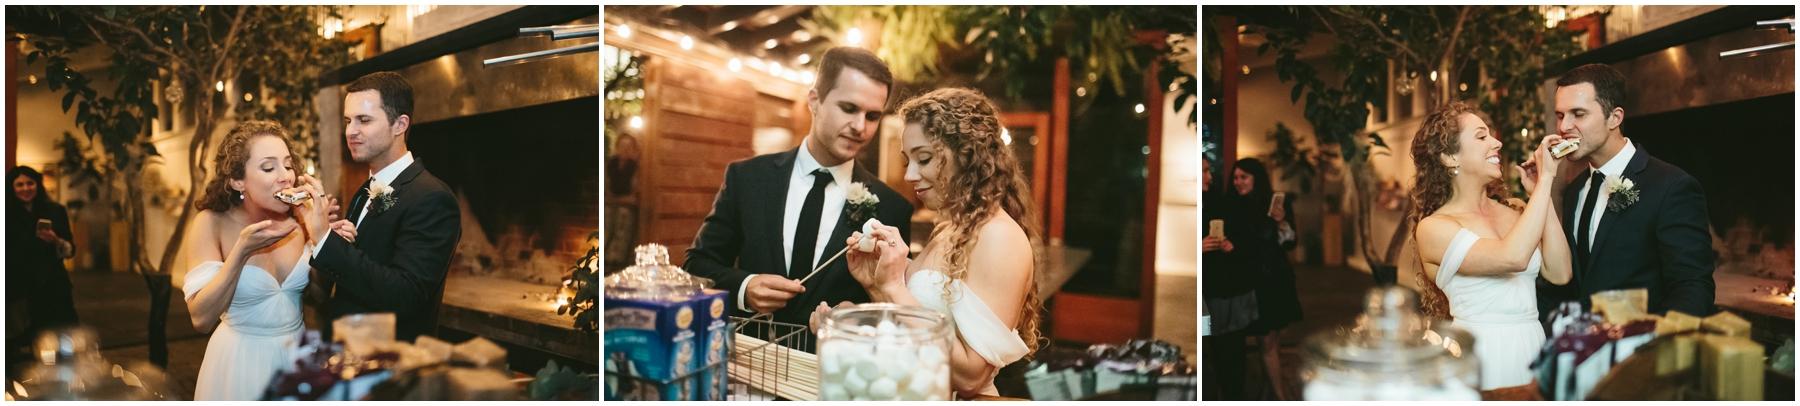 Emily+Paul-WEDDING_KellyBoitanoPhotography_0148